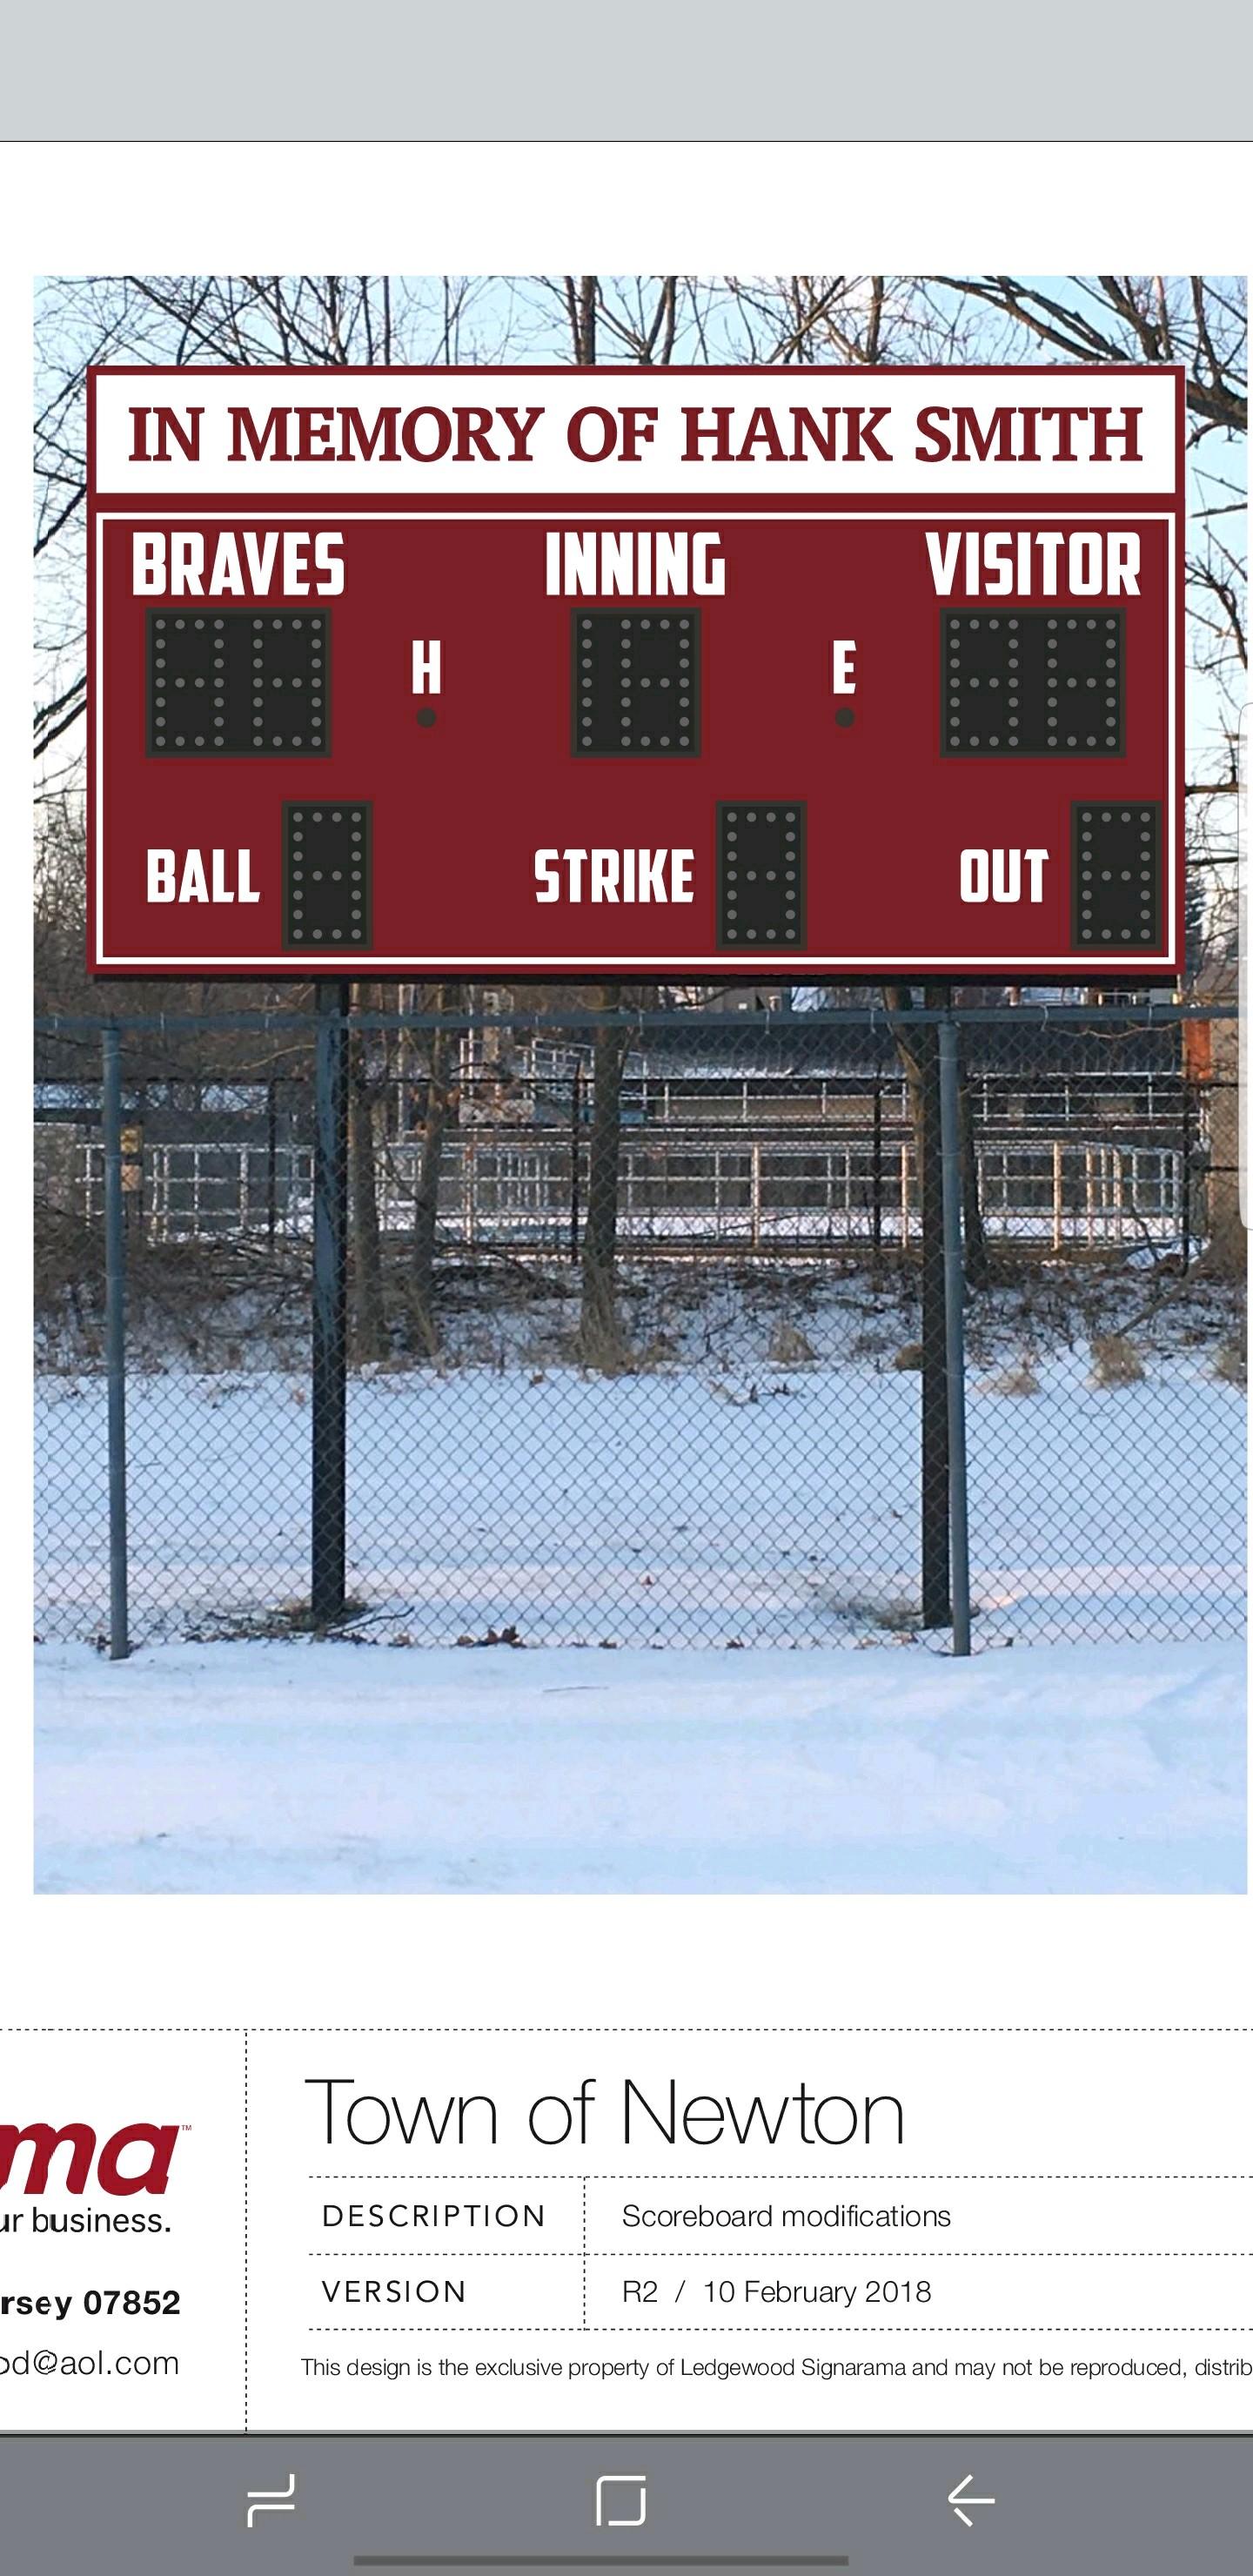 1bafcb395738bd507706_scoreboard.jpg